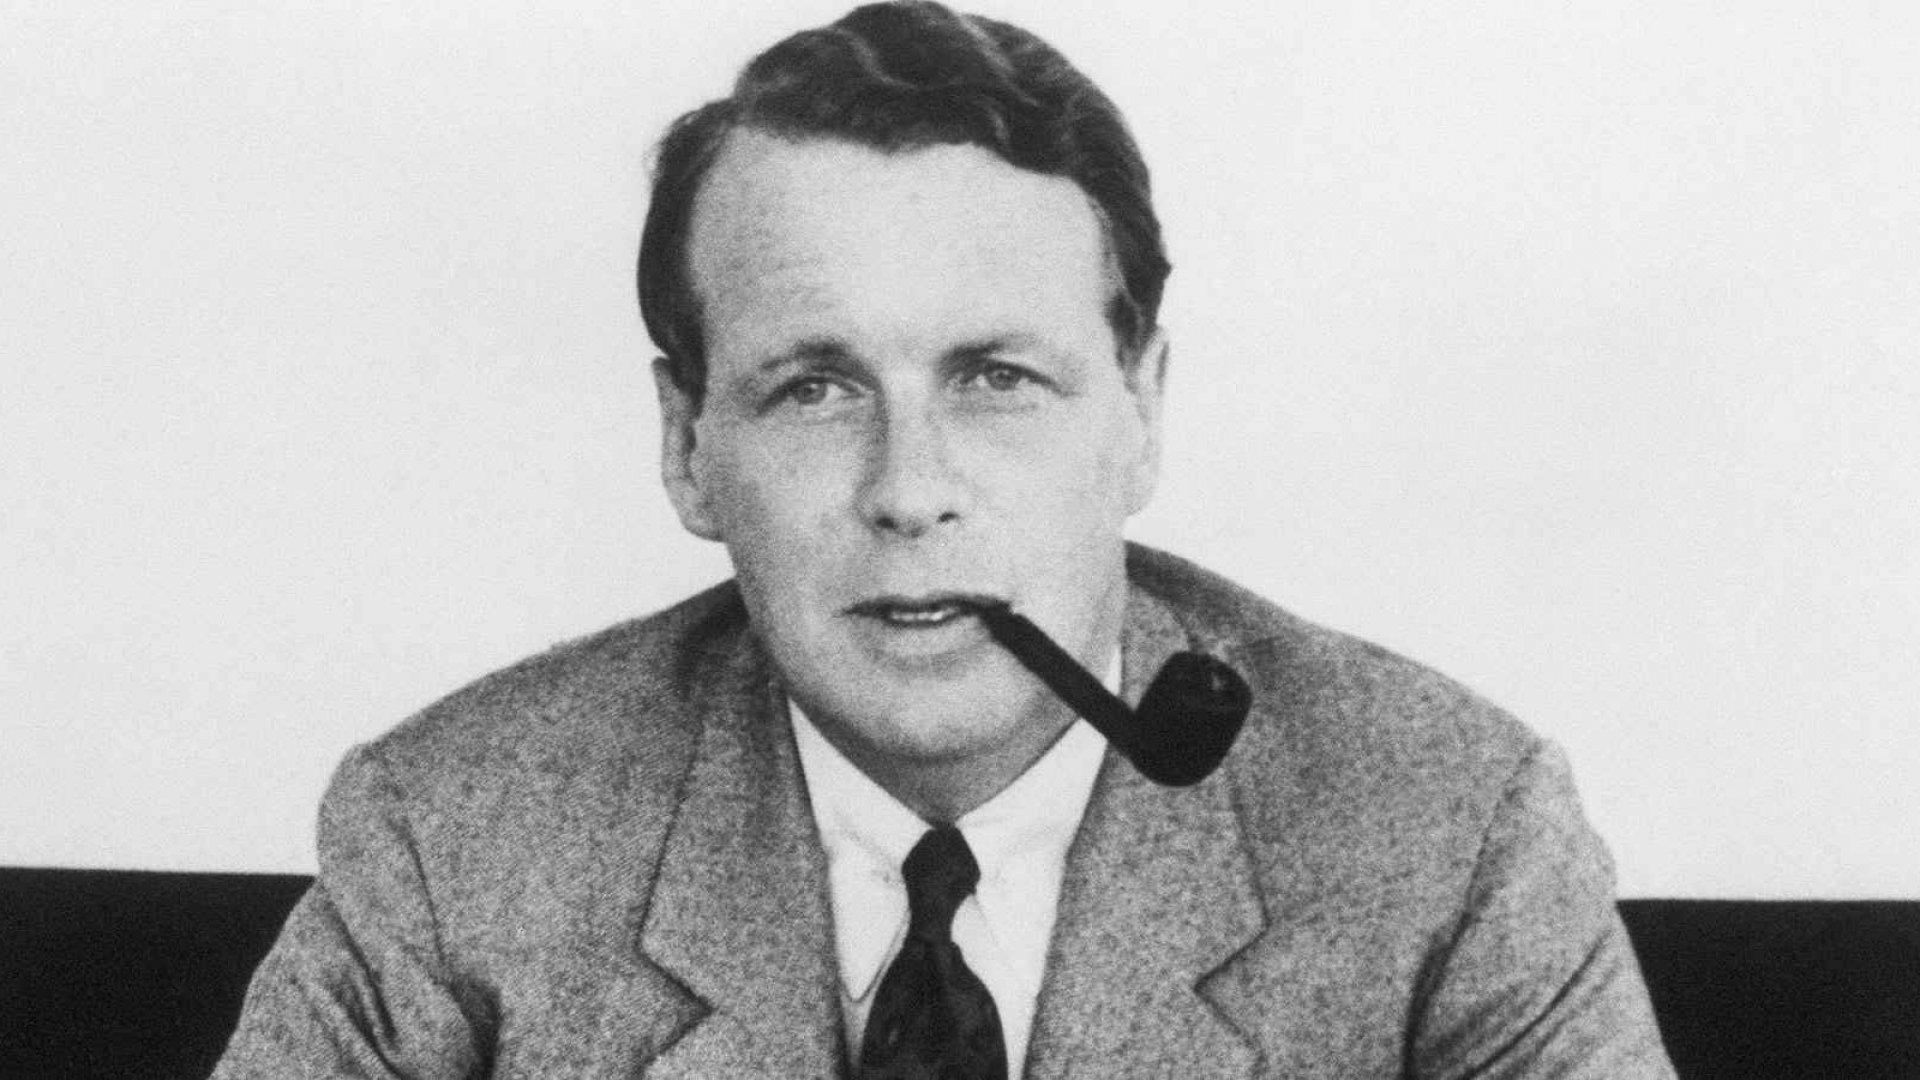 David Ogilvy in 1954.